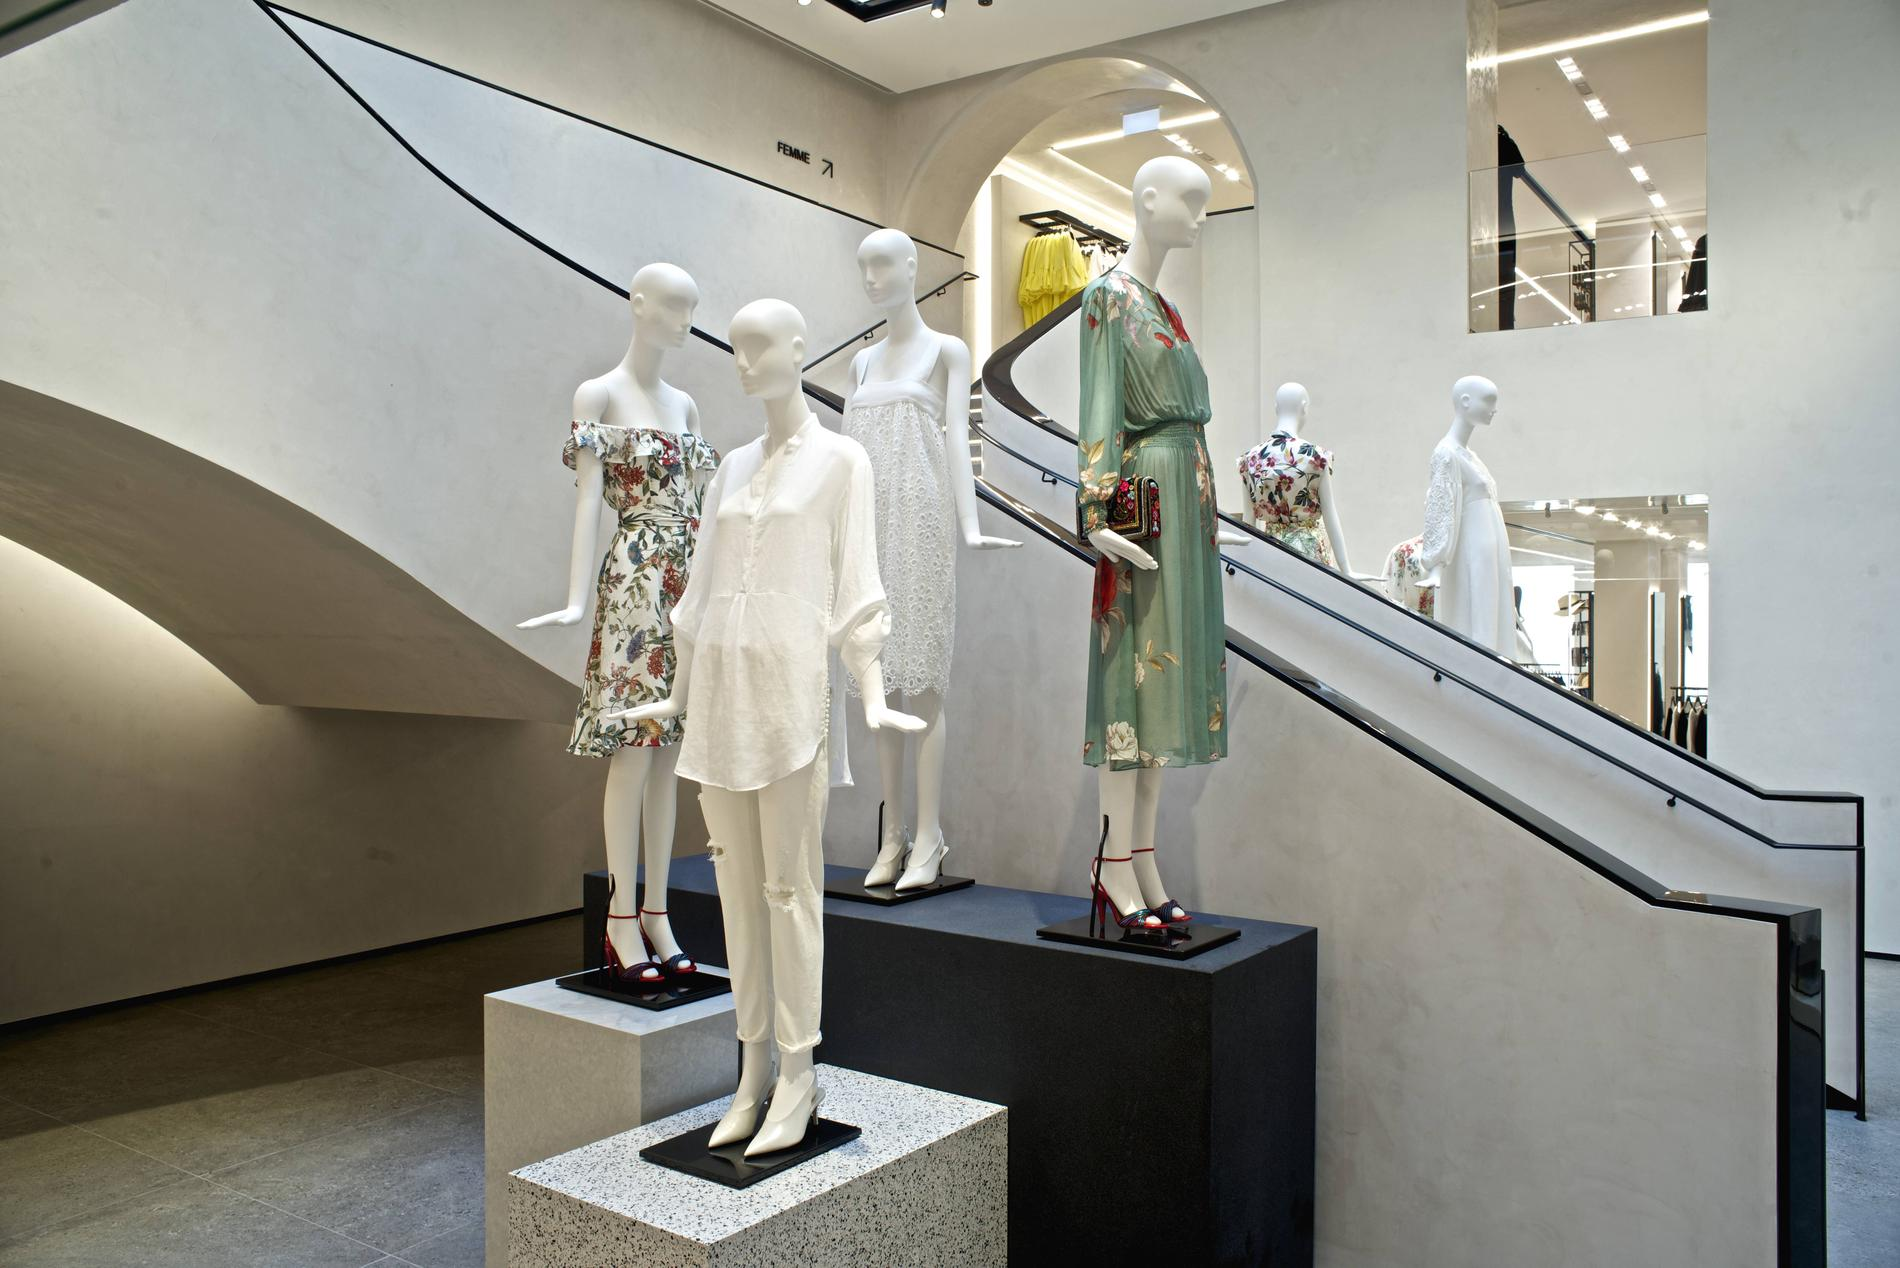 6dc67ea0eeb99 Le plus grand Zara de France ouvre ses portes - Madame Figaro